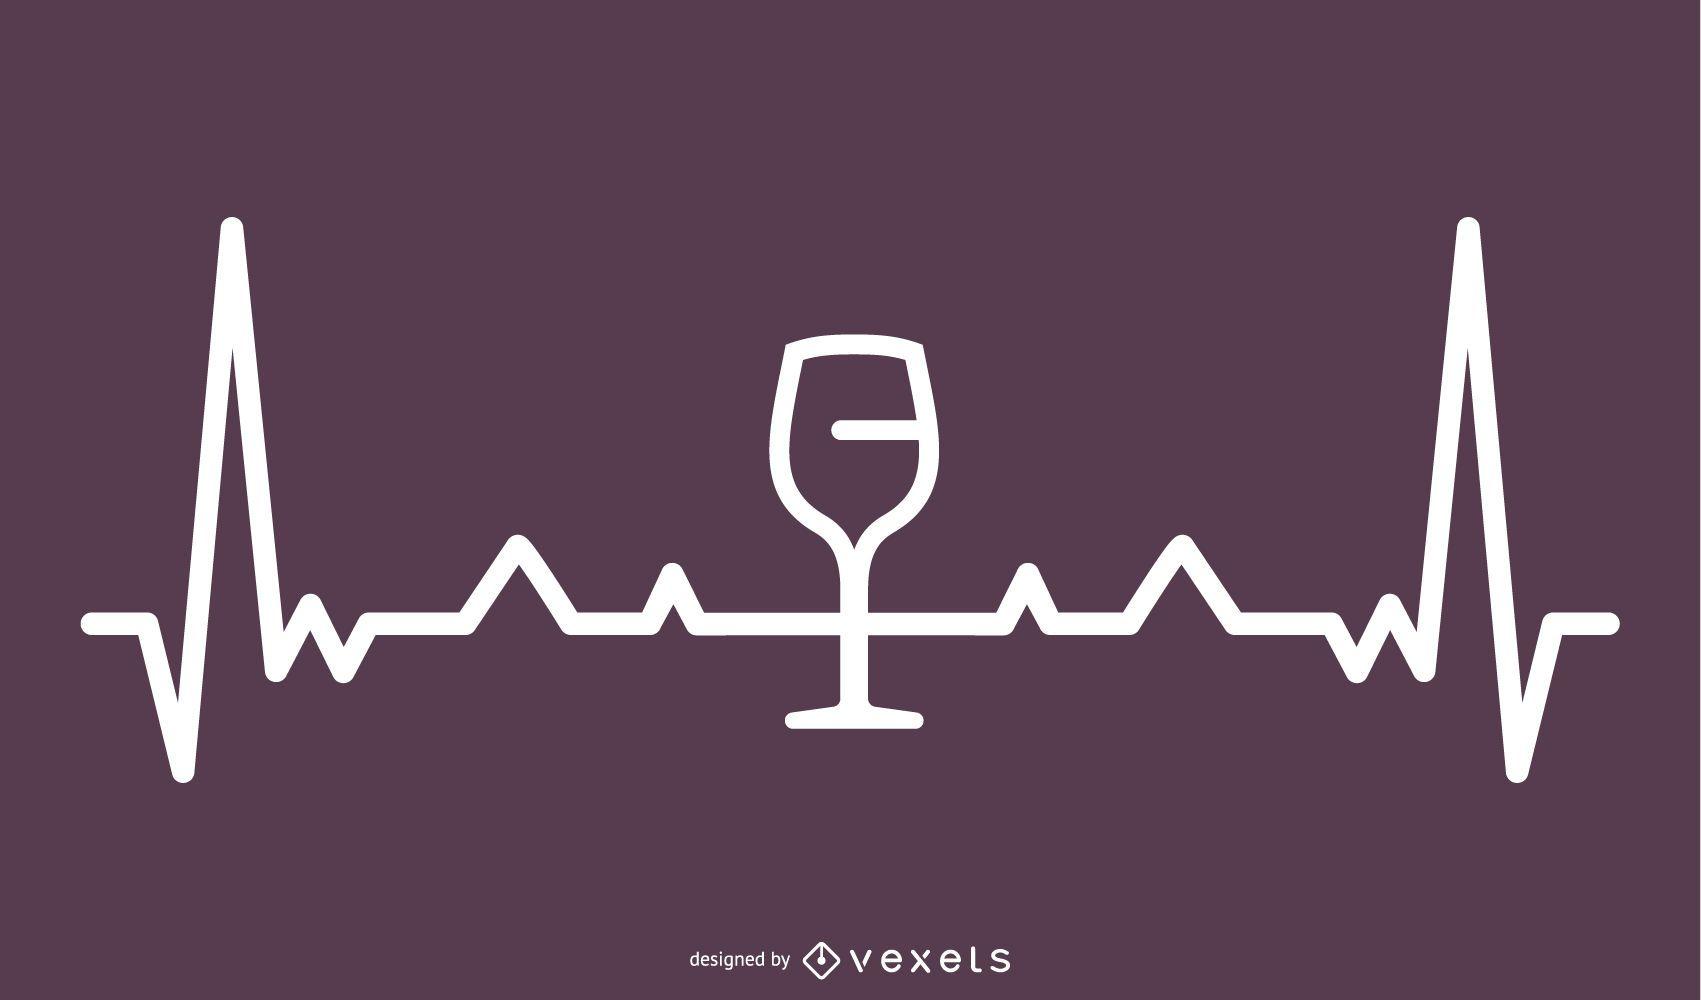 Wine Heartbeat Line Illustration